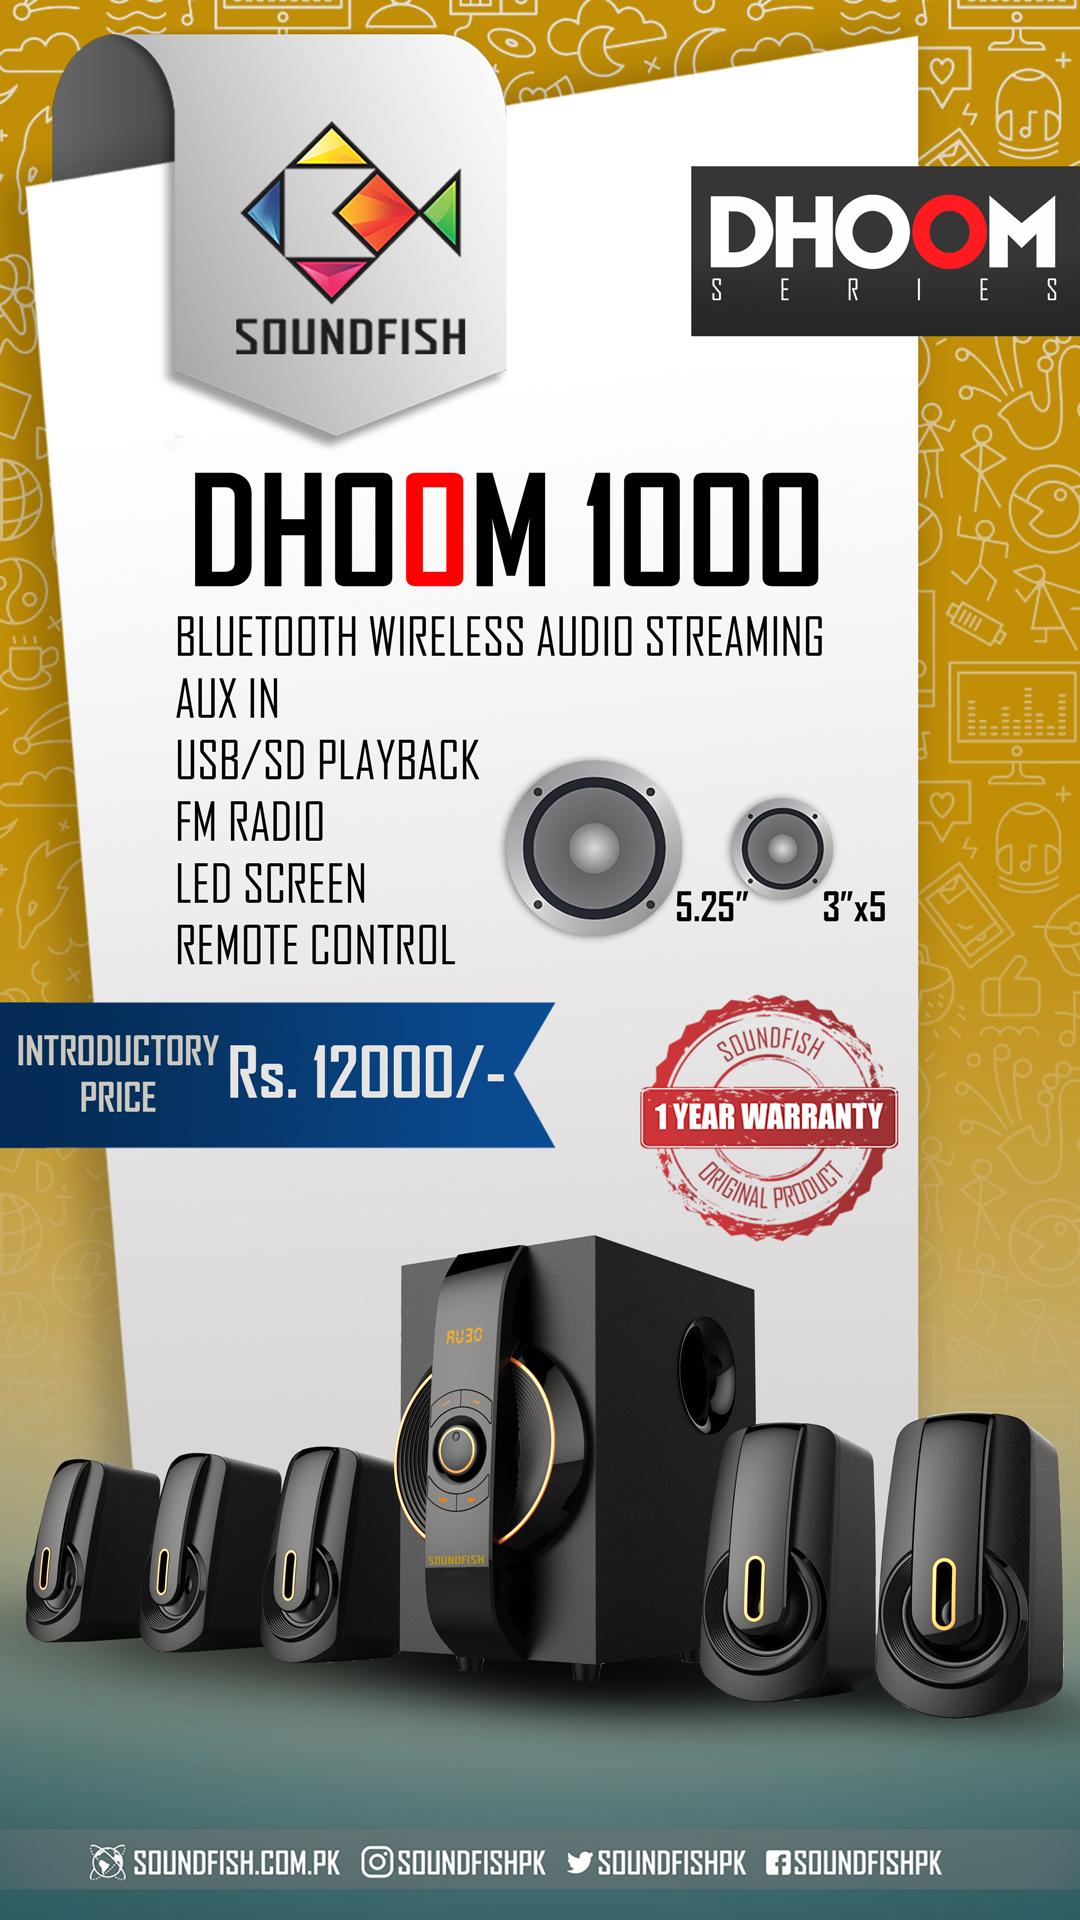 DHOOM-1000